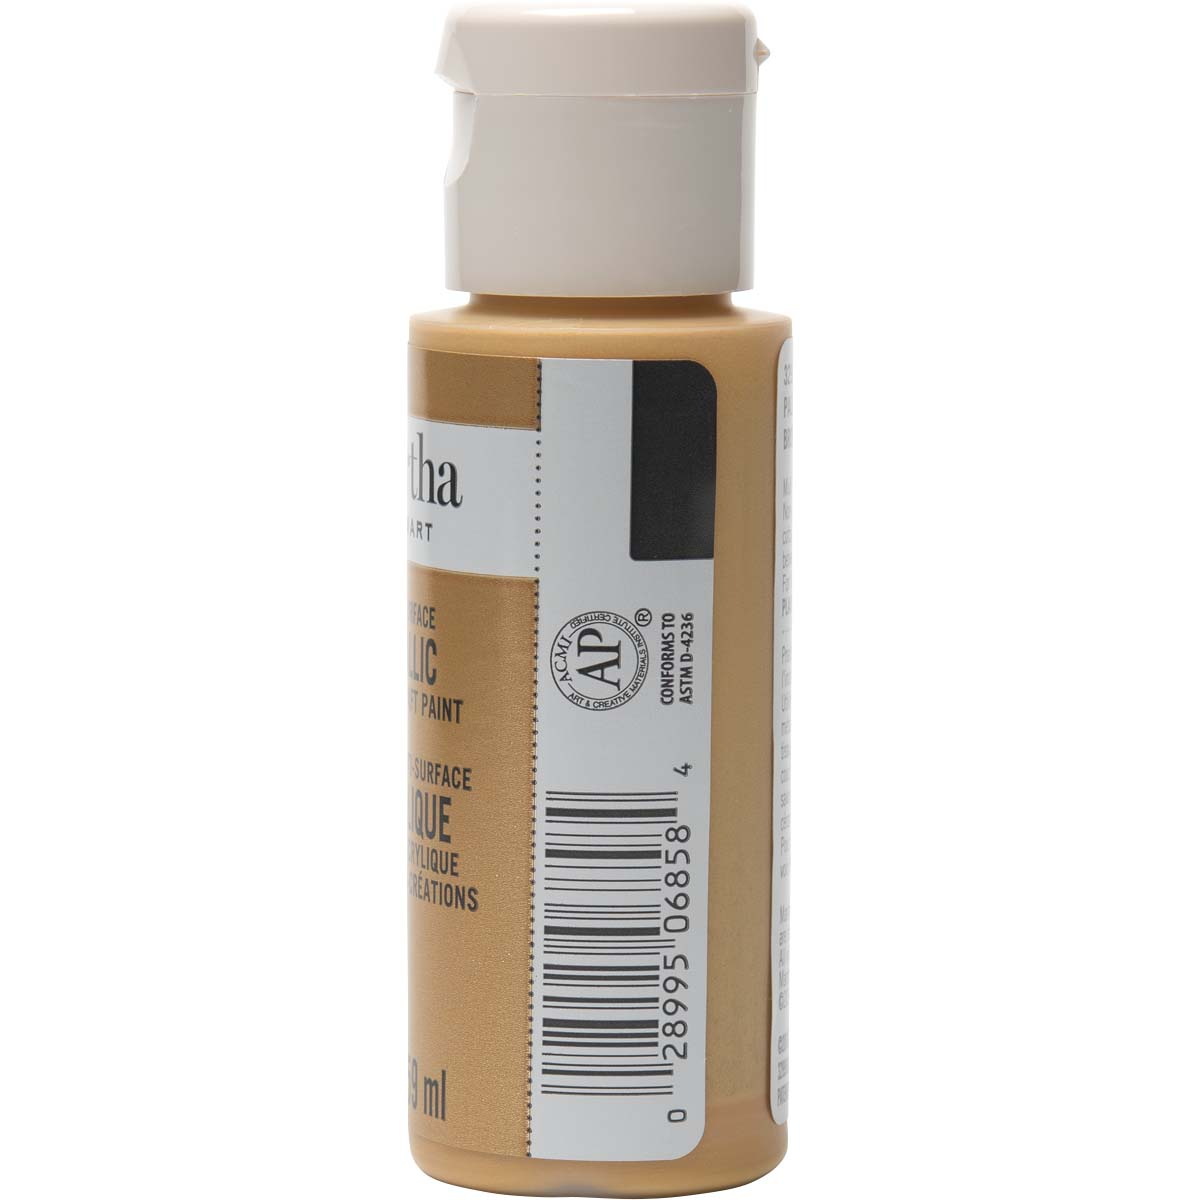 Martha Stewart® 2oz Multi-Surface Metallic Acrylic Craft Paint - Pale Bronze